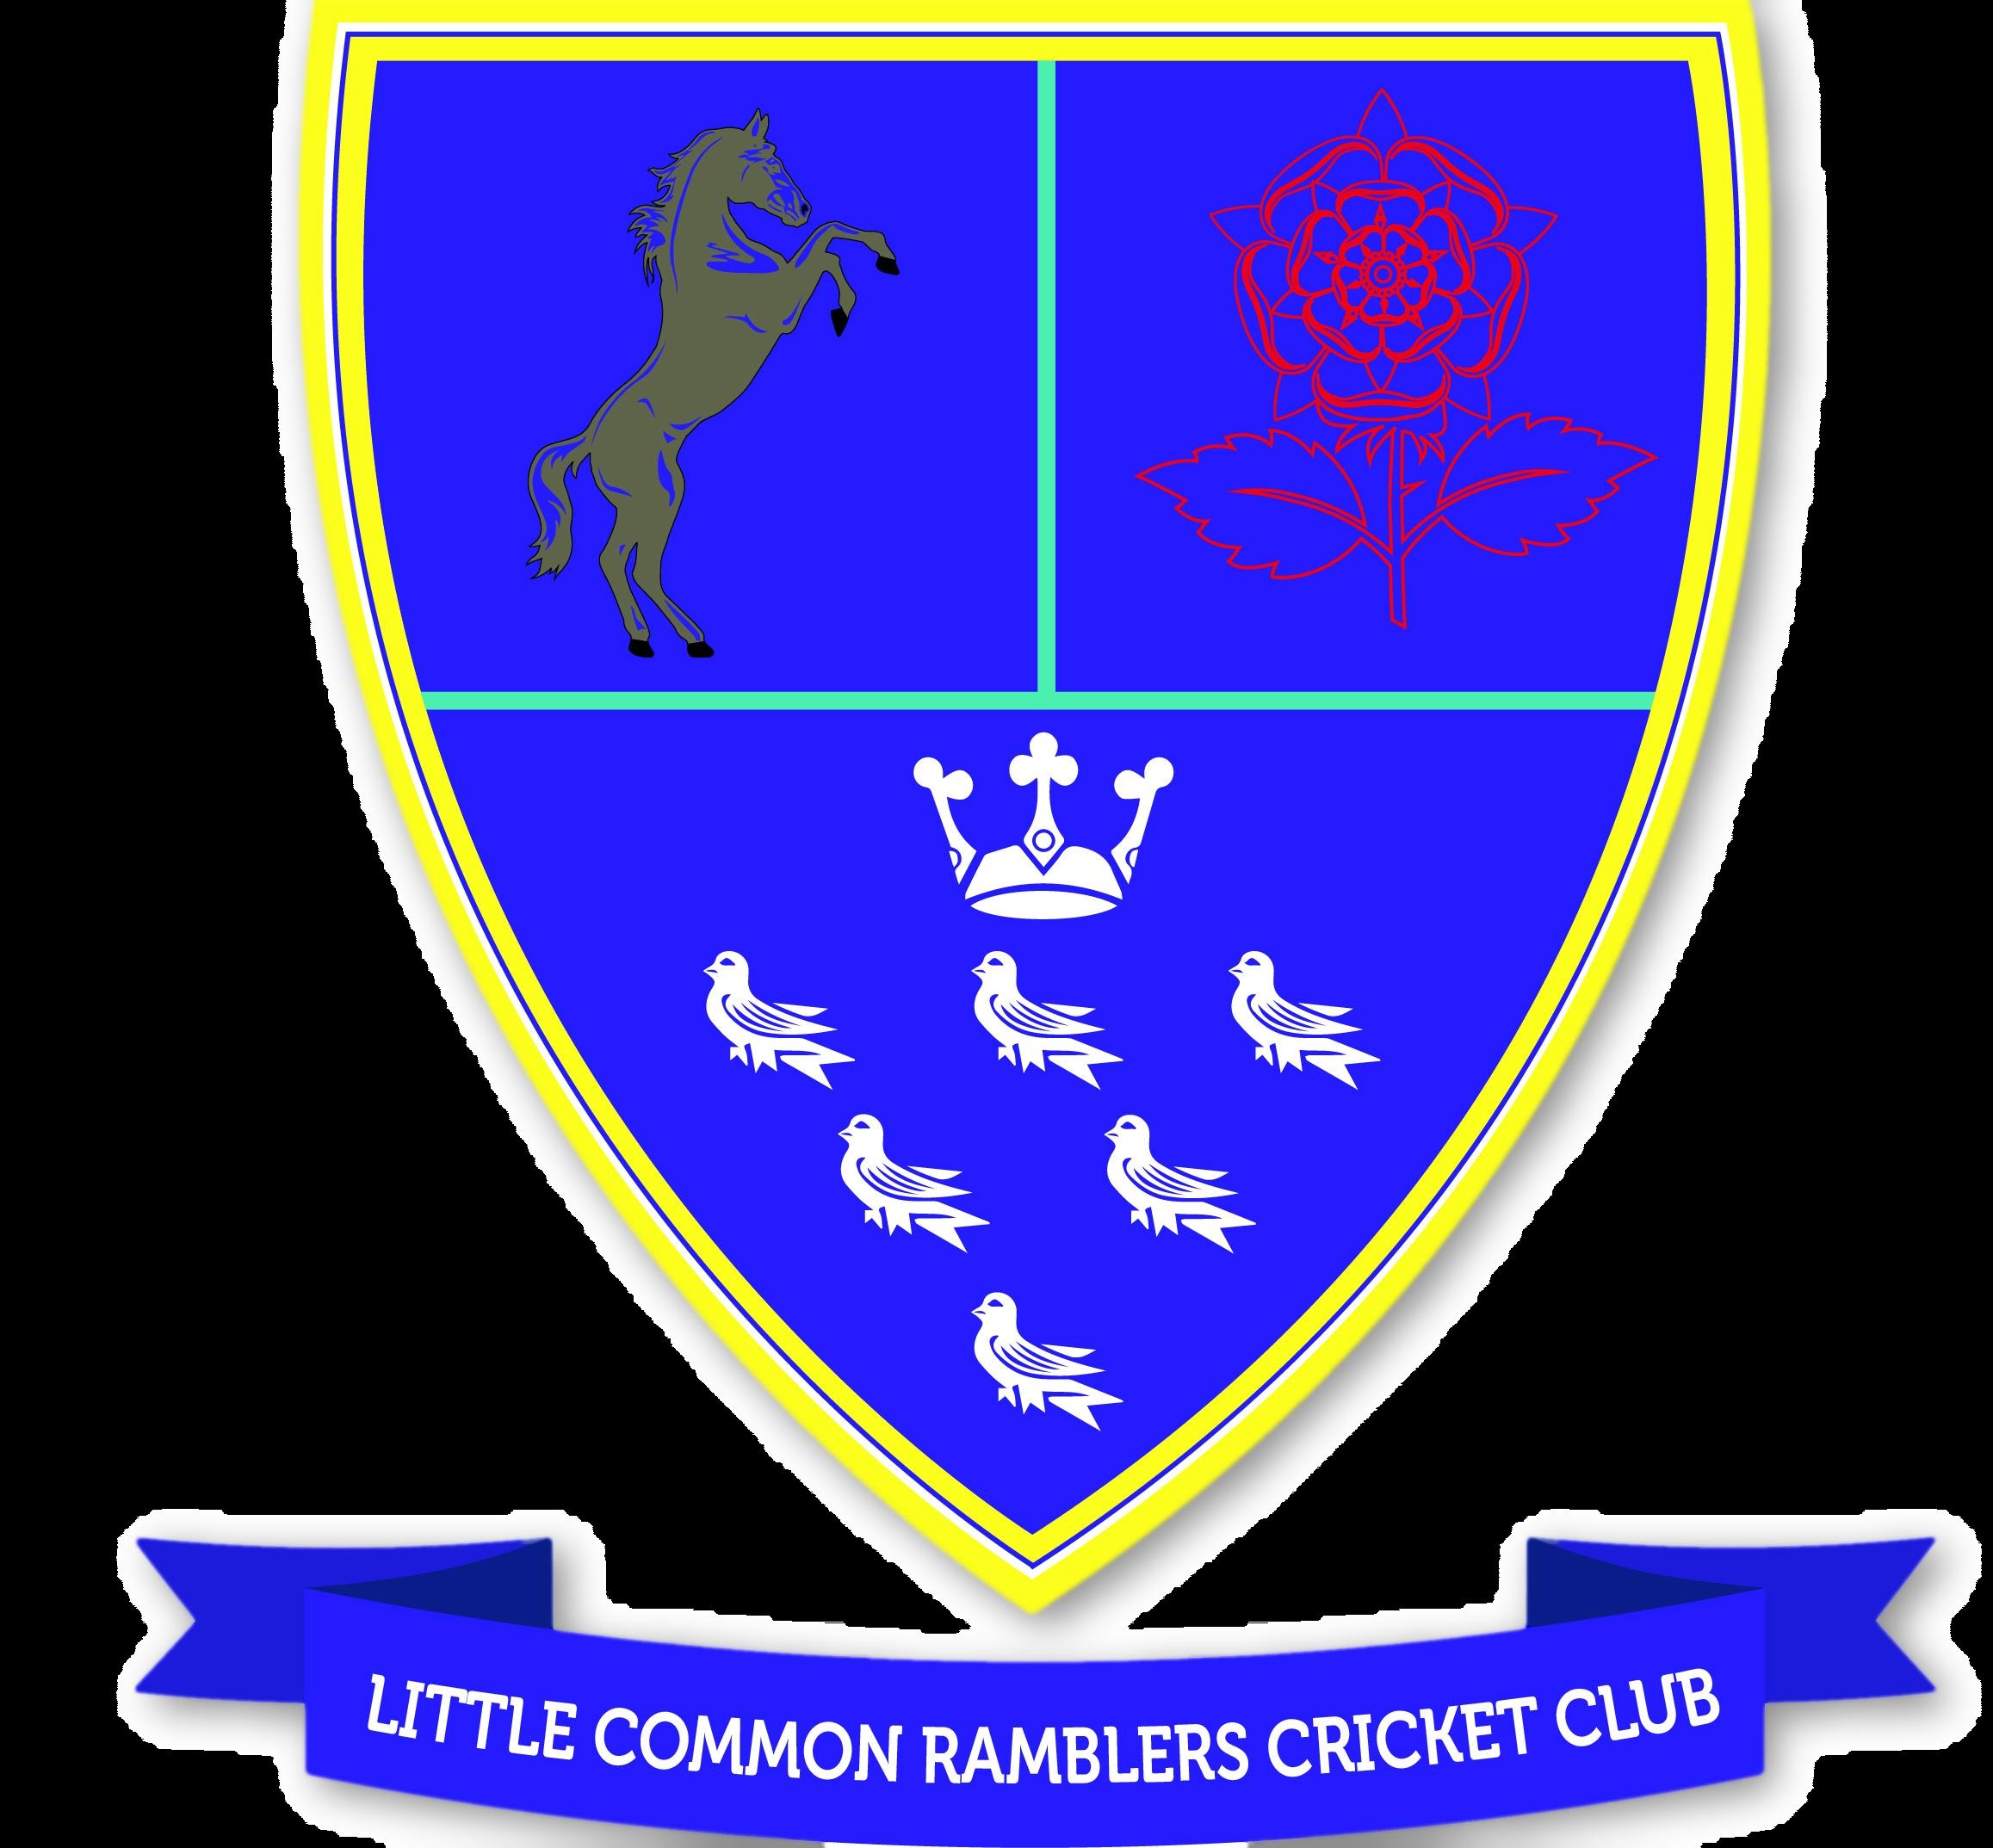 Little Common Ramblers Cricket Club